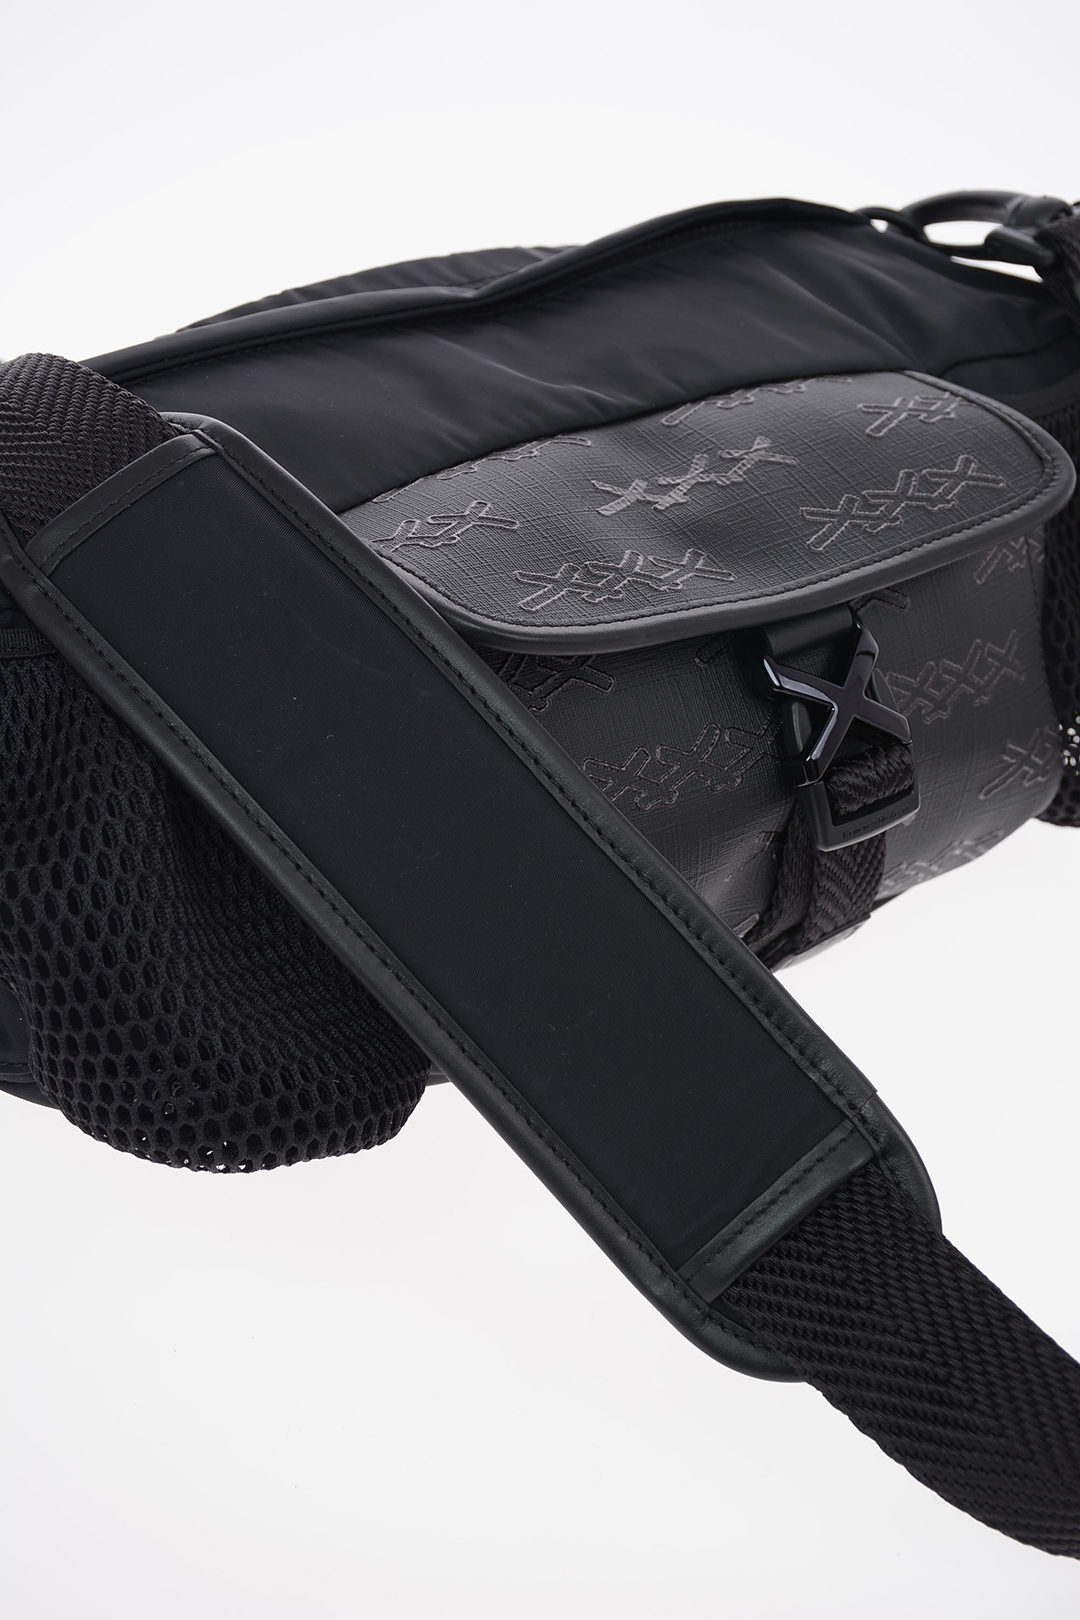 Ermenegildo Zegna Couture Utility Bum Bag With Shoulder Strap Men Glamood Outlet